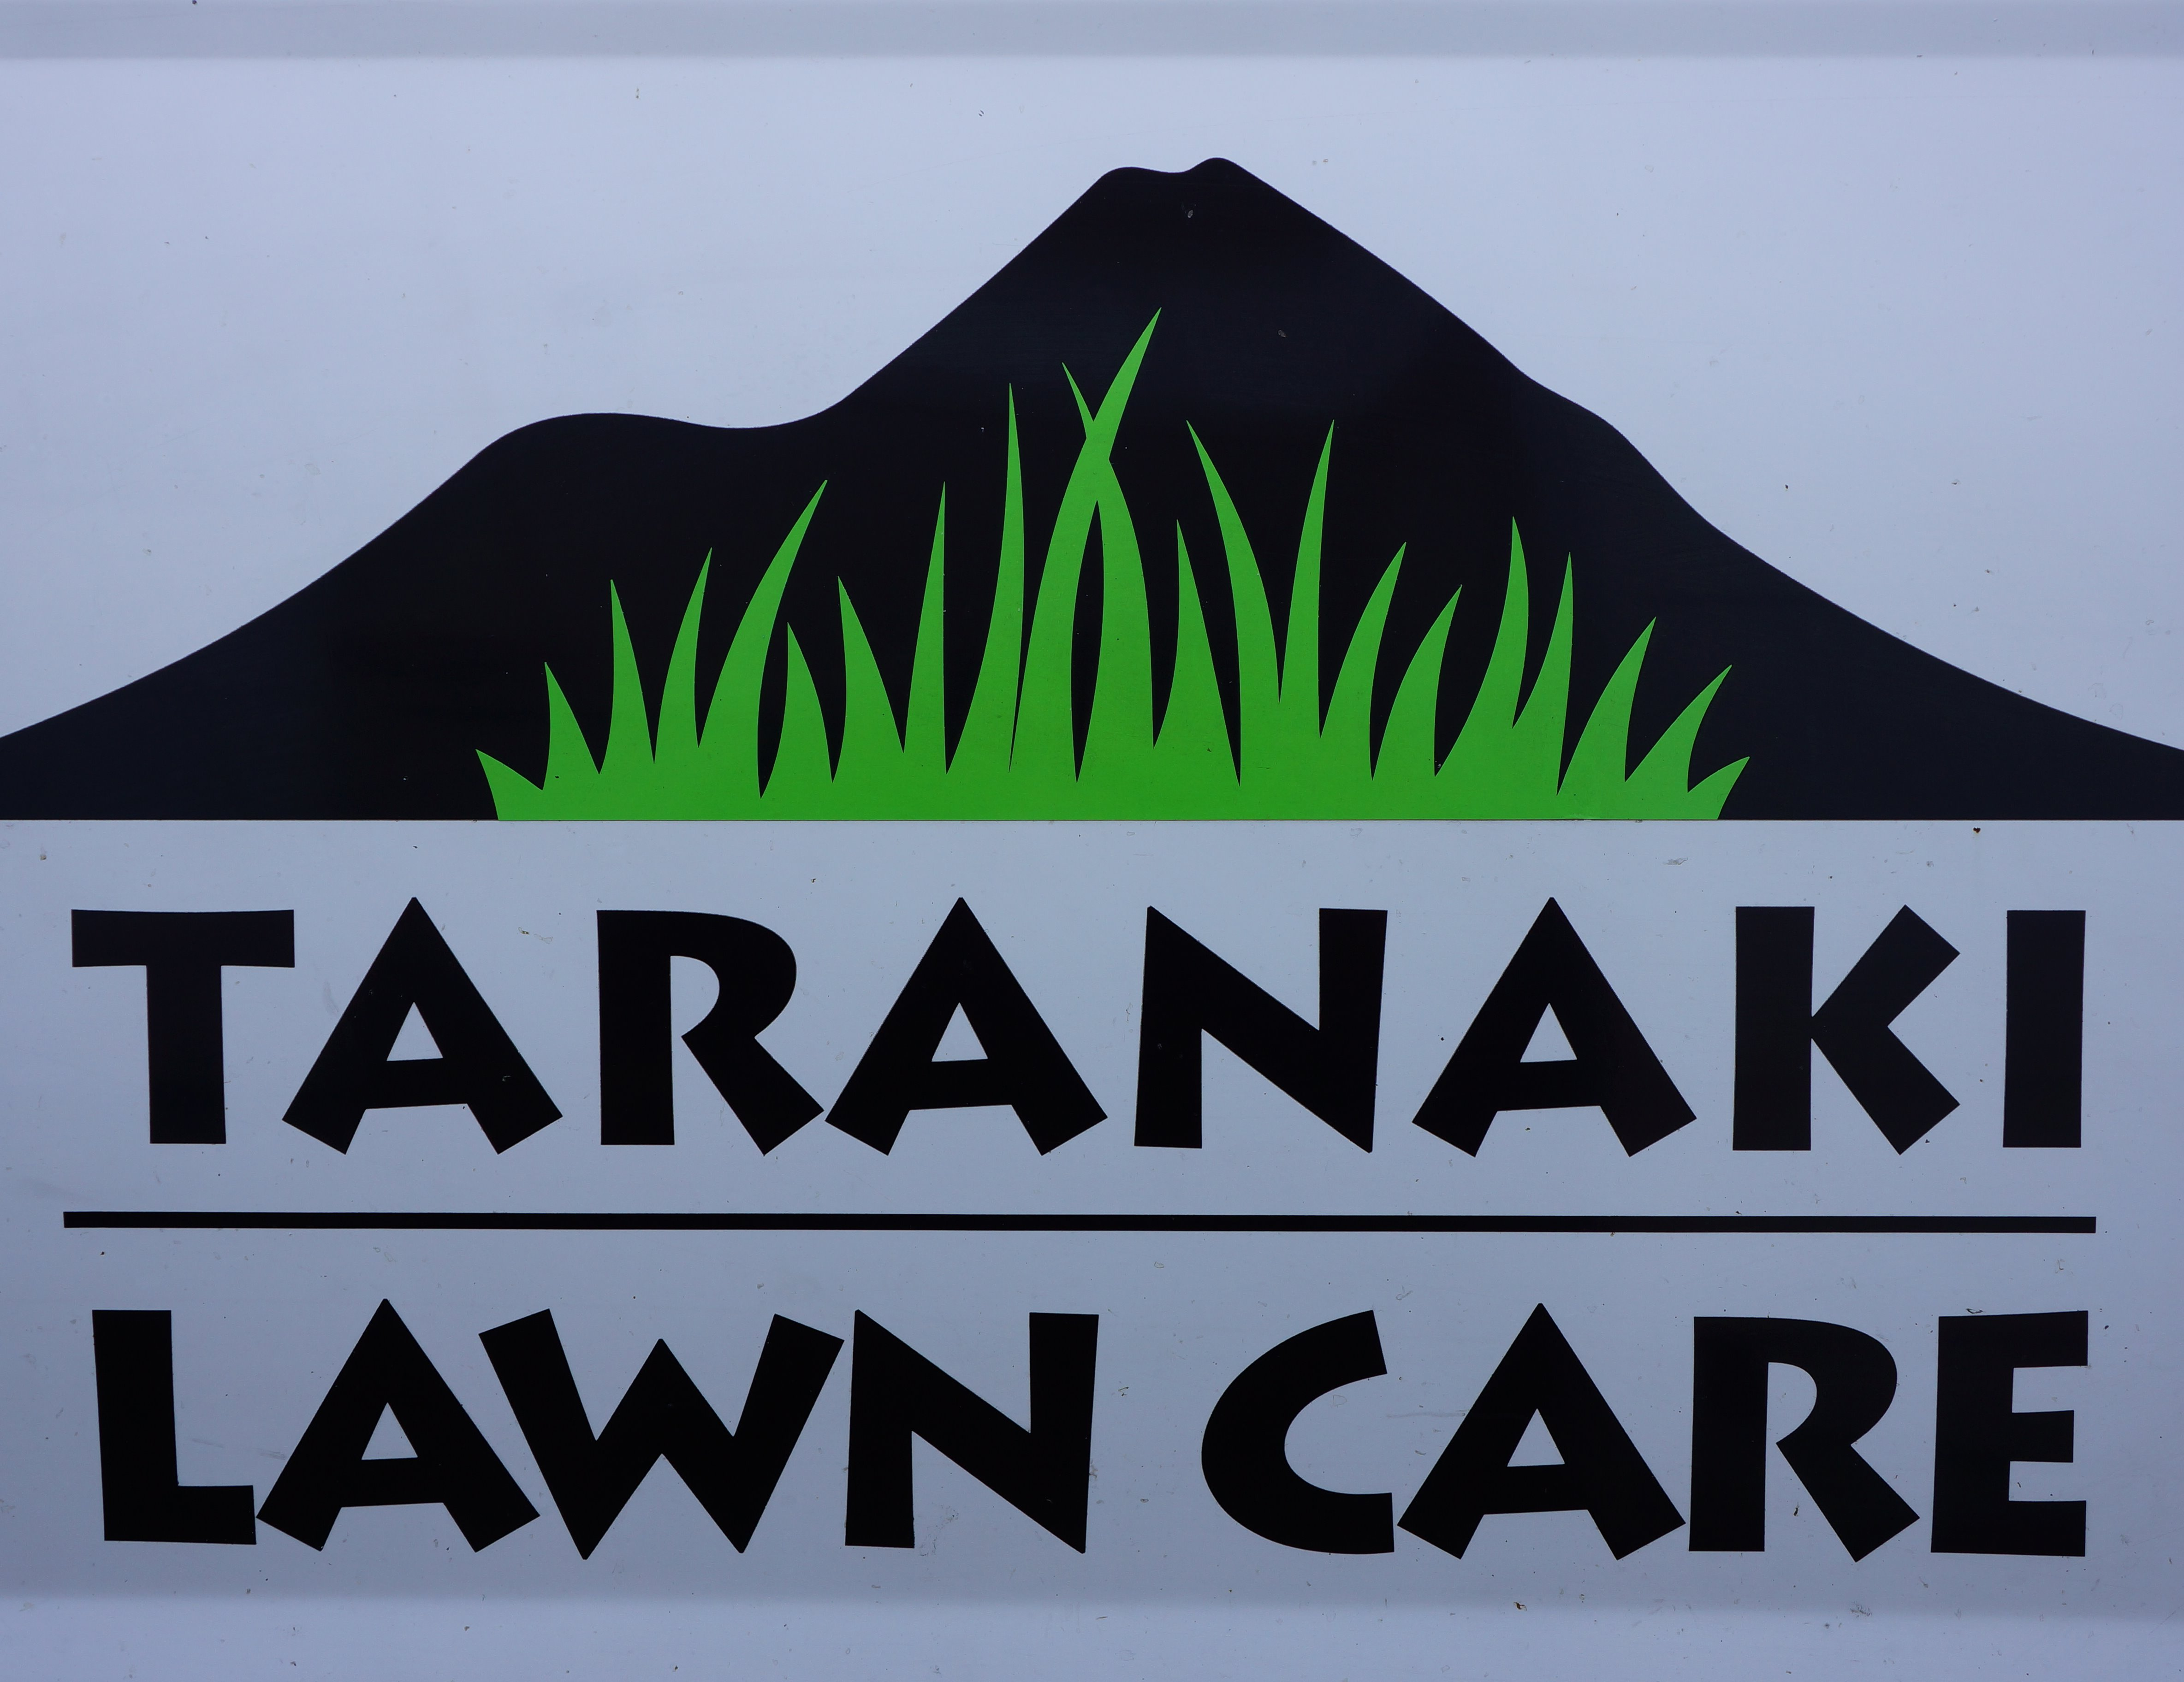 Taranaki Lawn Care